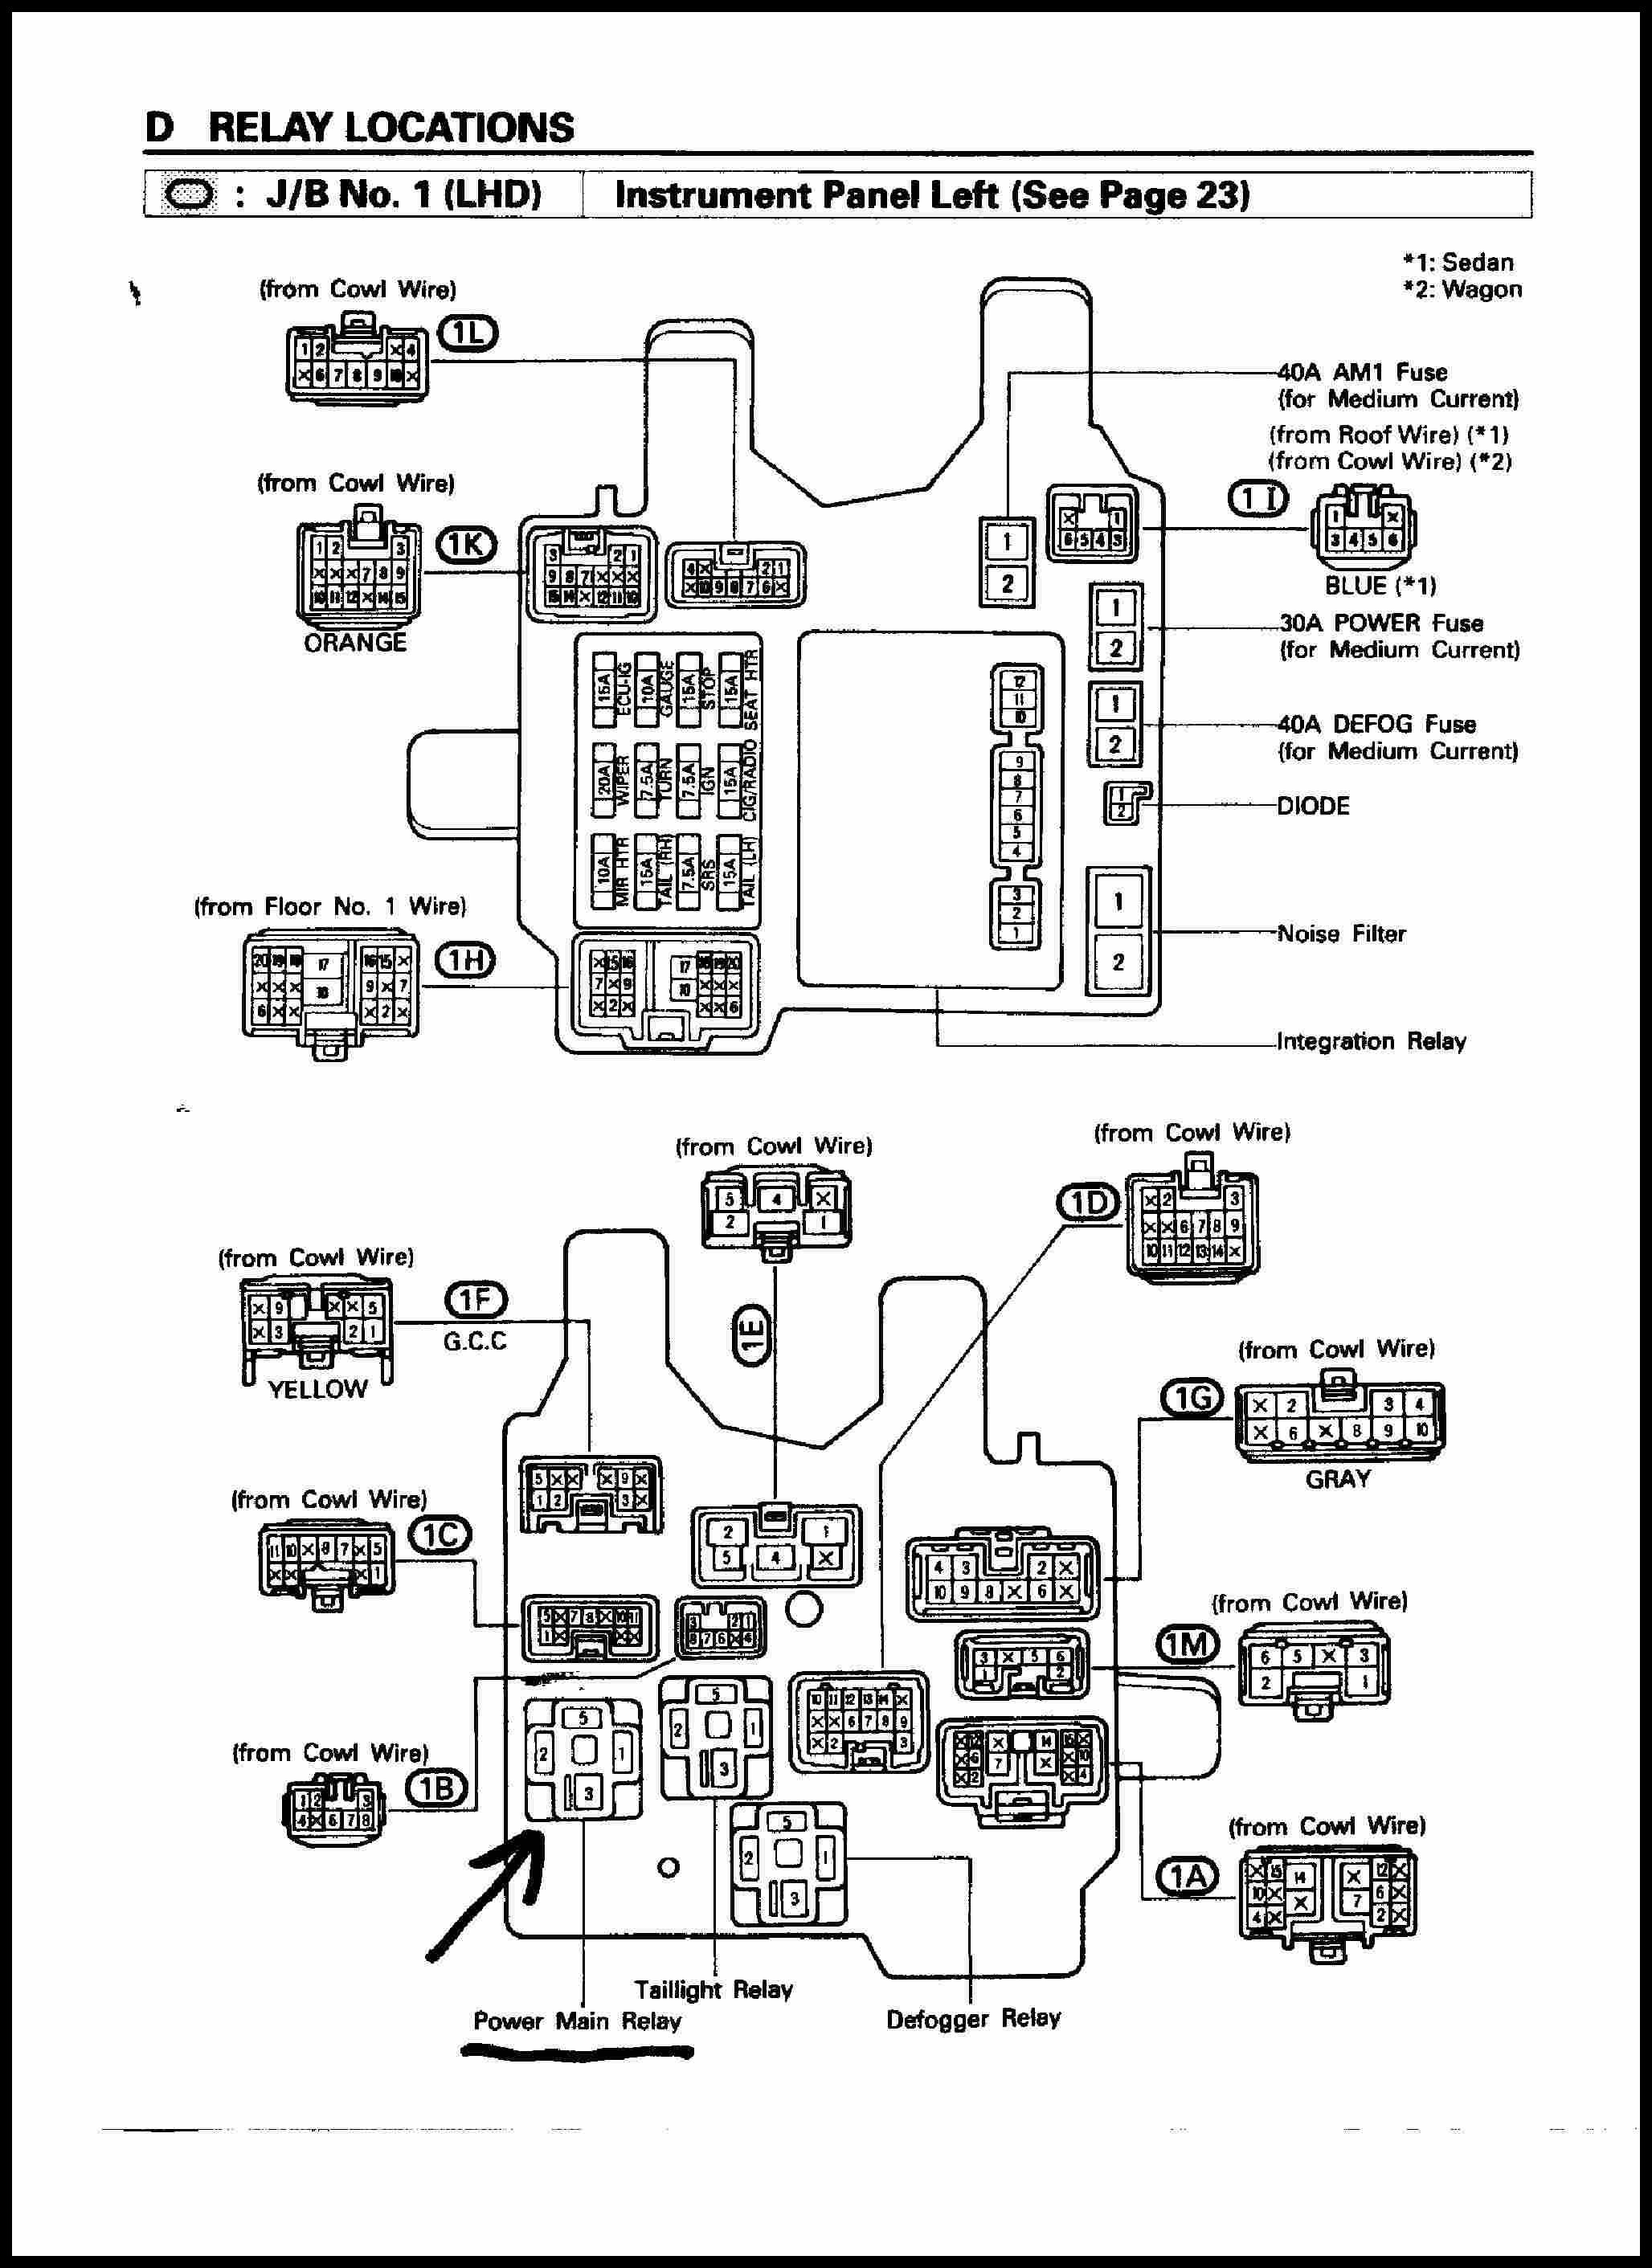 1996 toyota Camry Spark Plug Wire Diagram Best 1997 toyota Corolla Wiring Diagram 2012 10